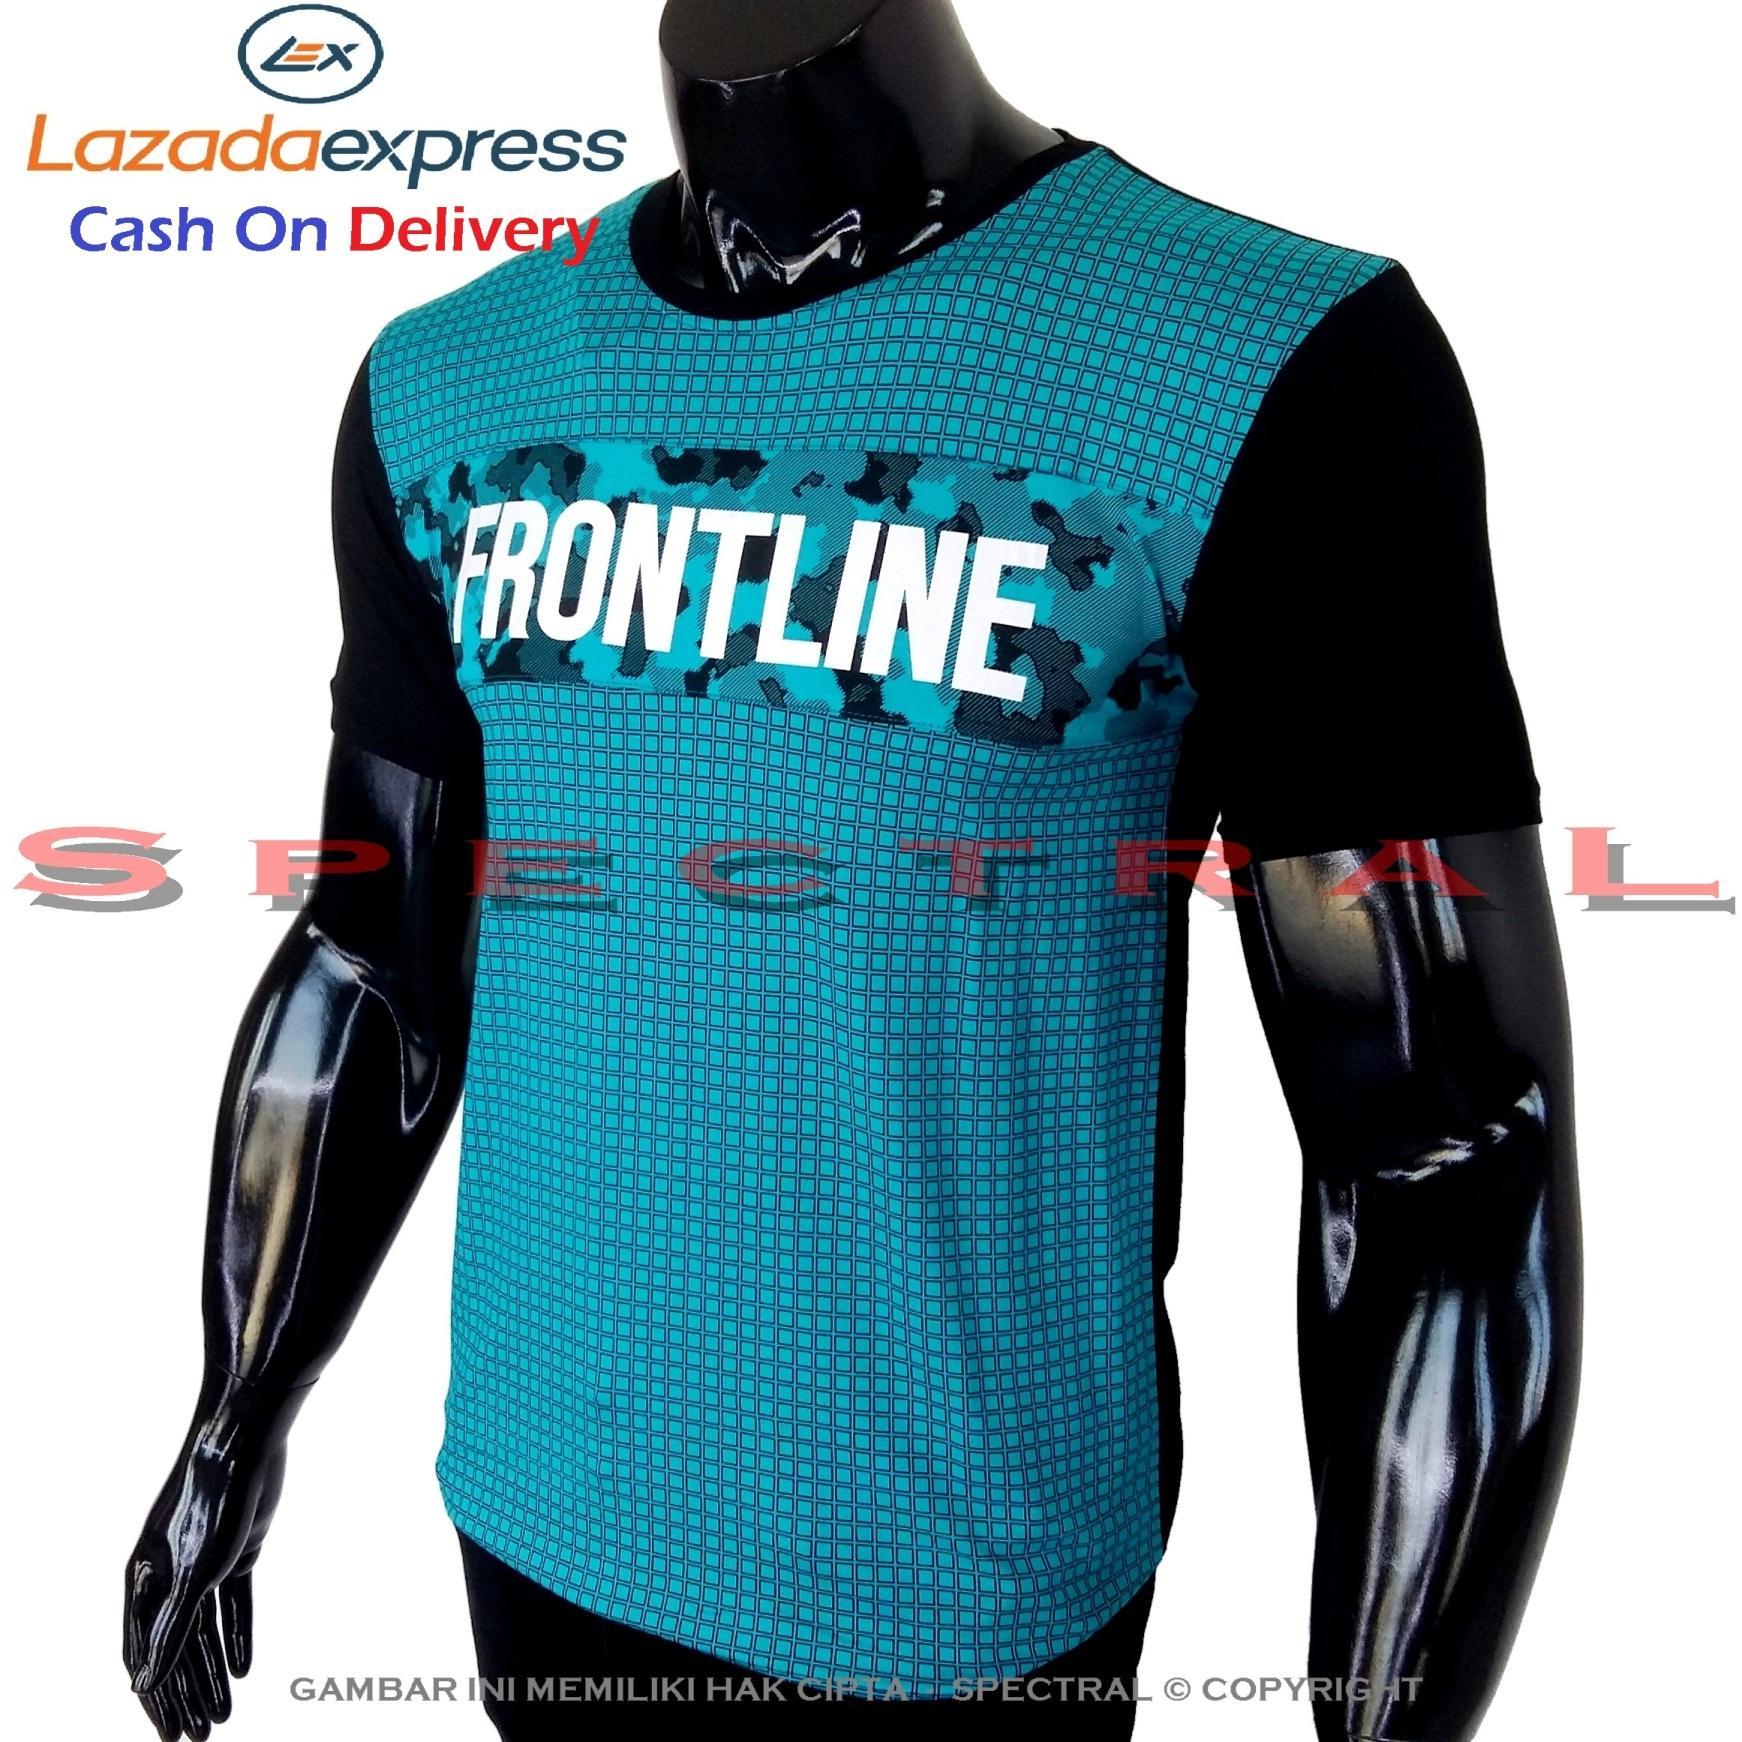 Spectral - Kaos Distro FRONTLINE Soft Rayon Viscose Lycra Pola M Fit To L Simple Fashionable Tidak